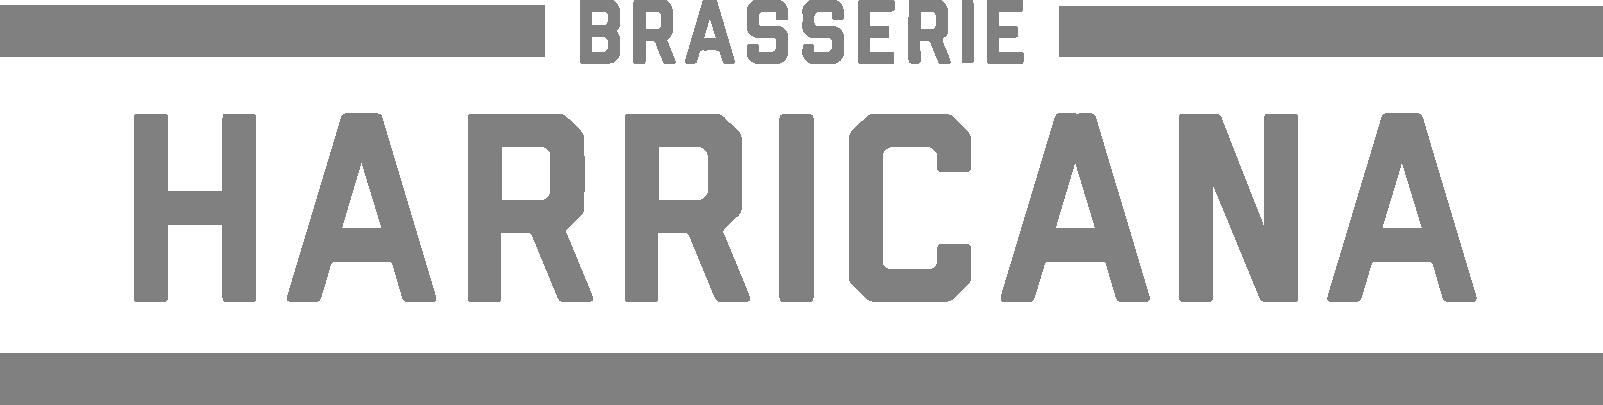 Brasserie Harricana